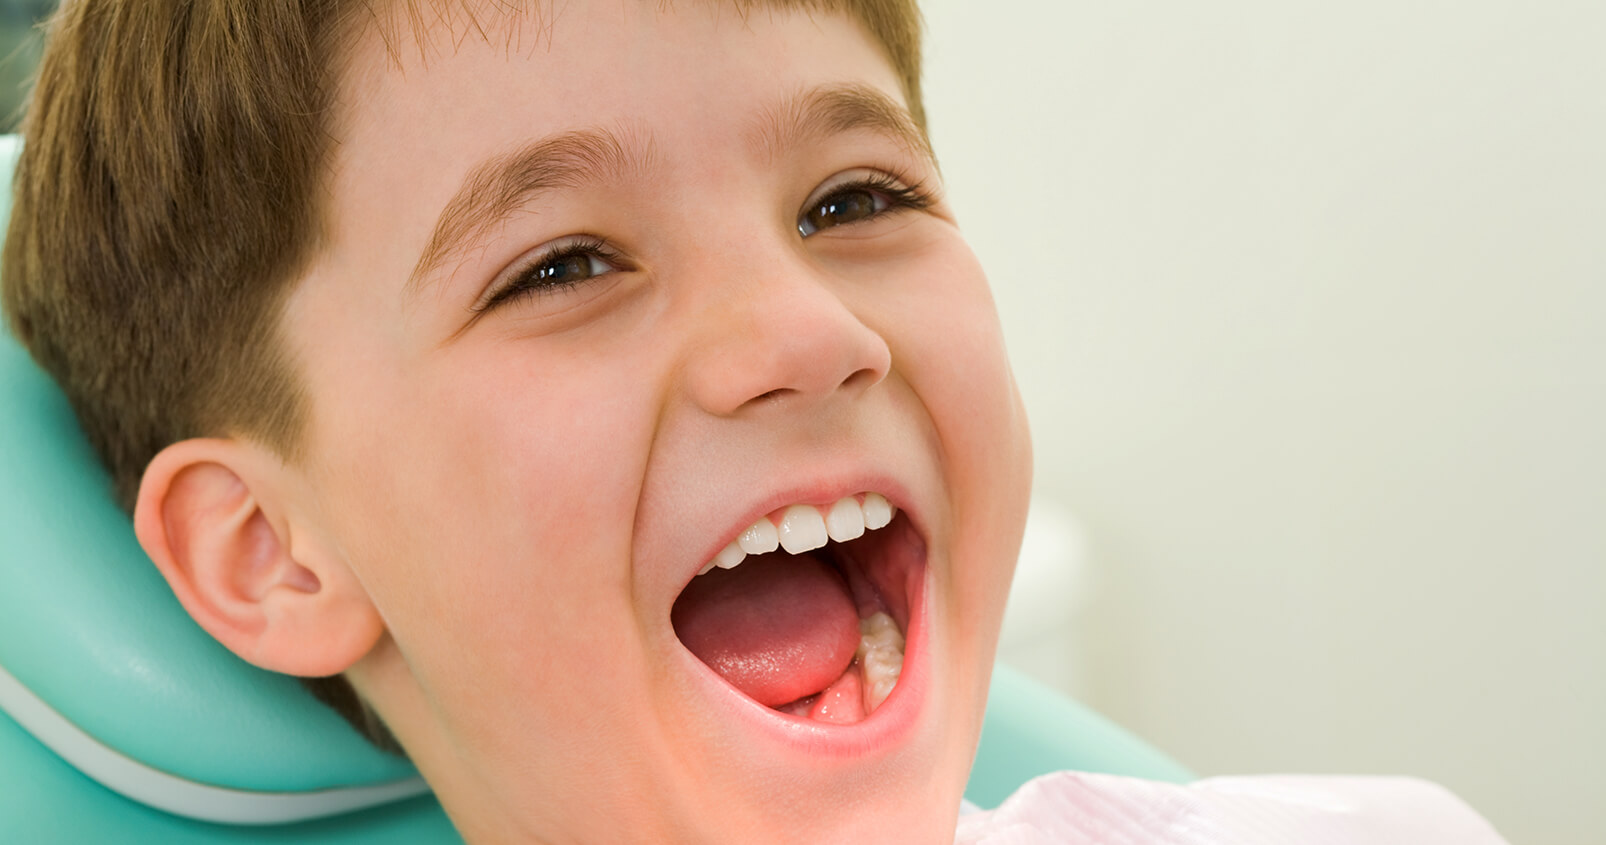 Find a compassionate children's dental office in Azusa, CA